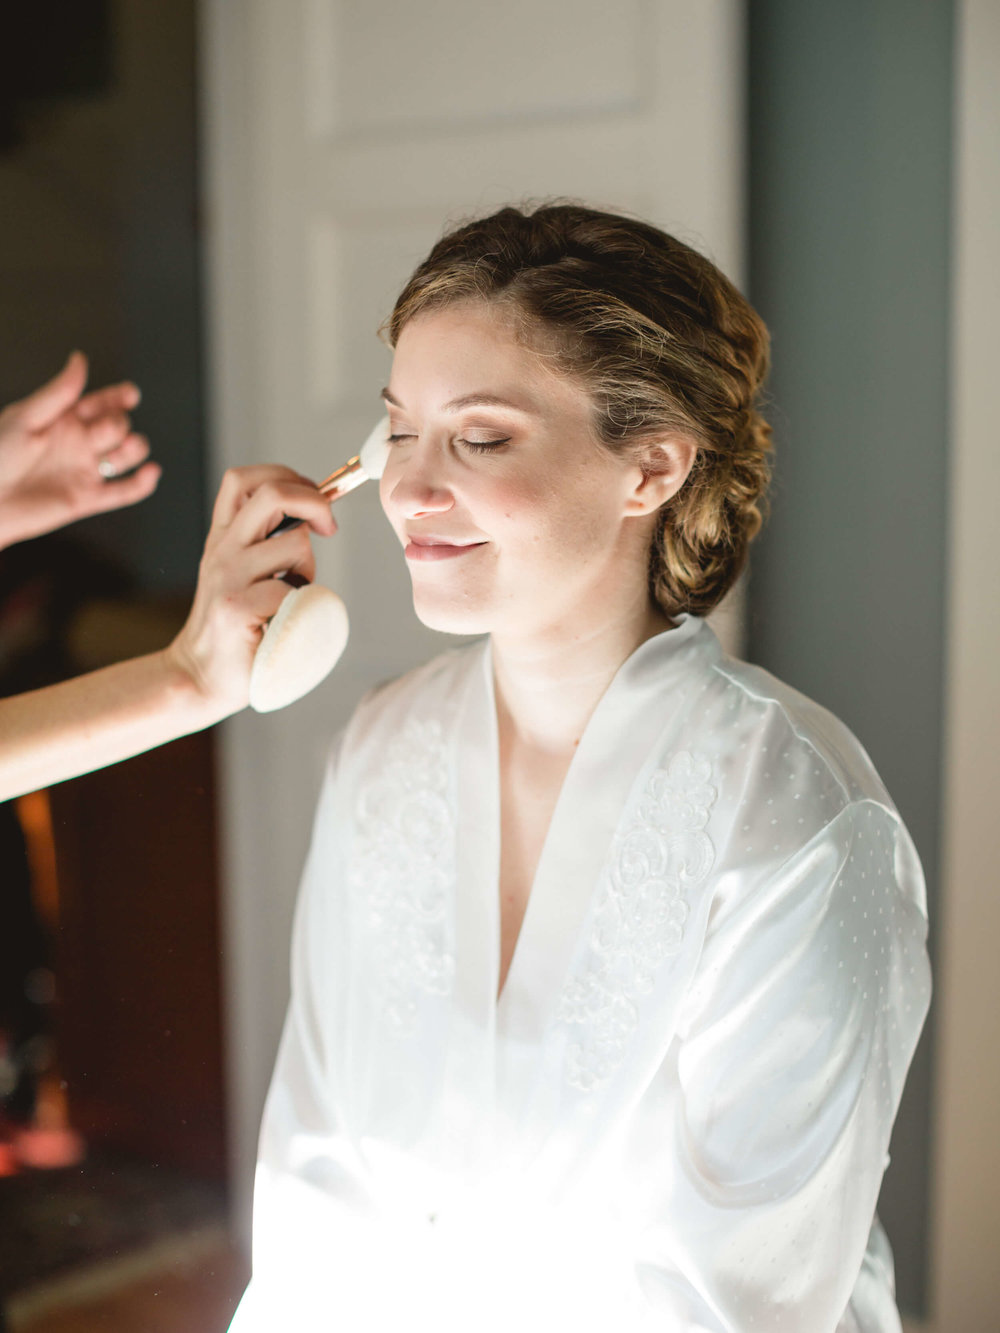 rochelle-louise-photography-acowsay-cinema-wisconsin-wedding-5.jpg